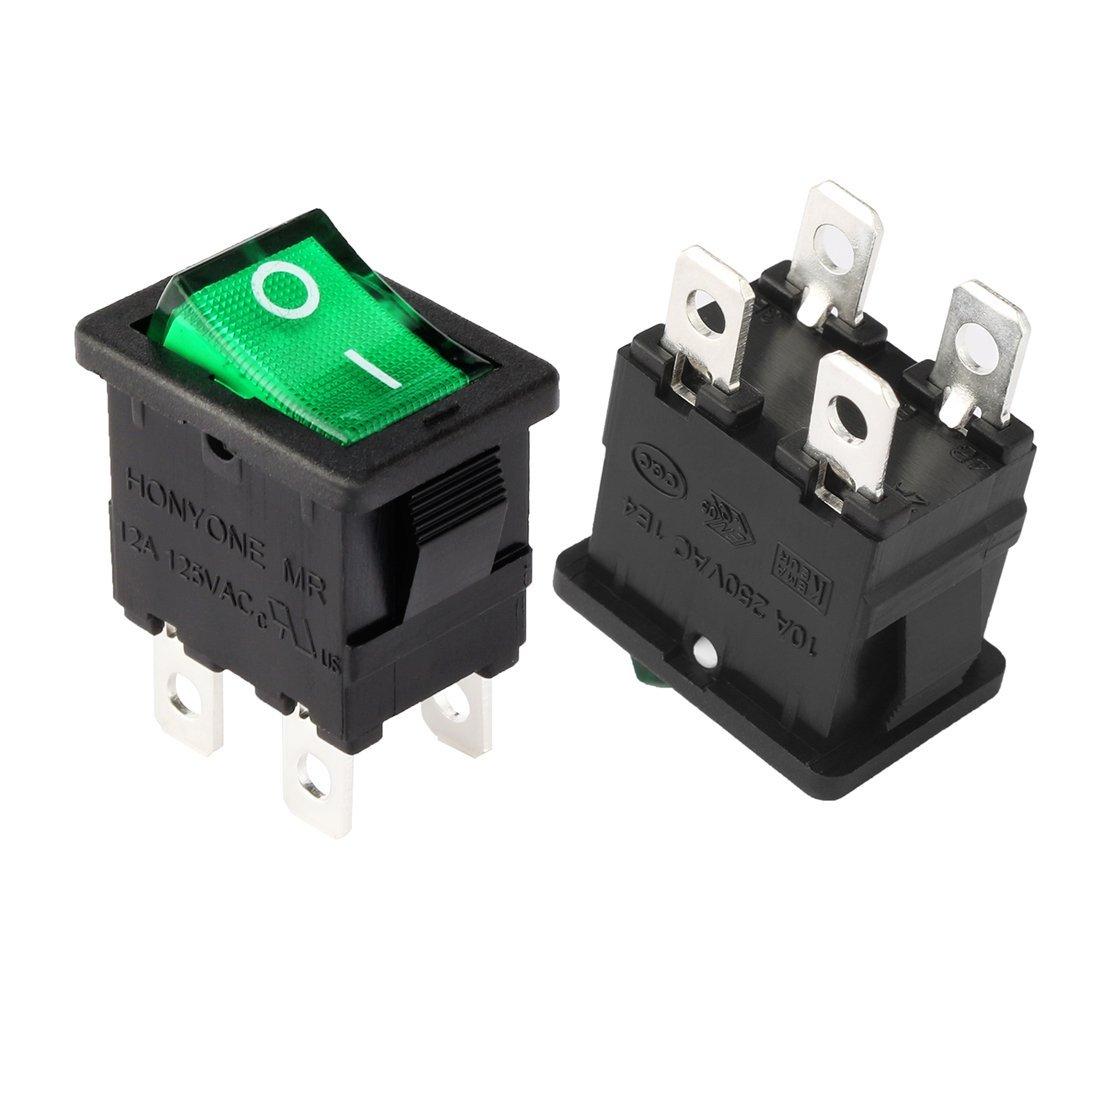 Wiring A 4-Pin Dpst Illuminated On-Off Rocker Switch - Electrics - 4 Pin Rocker Switch Wiring Diagram